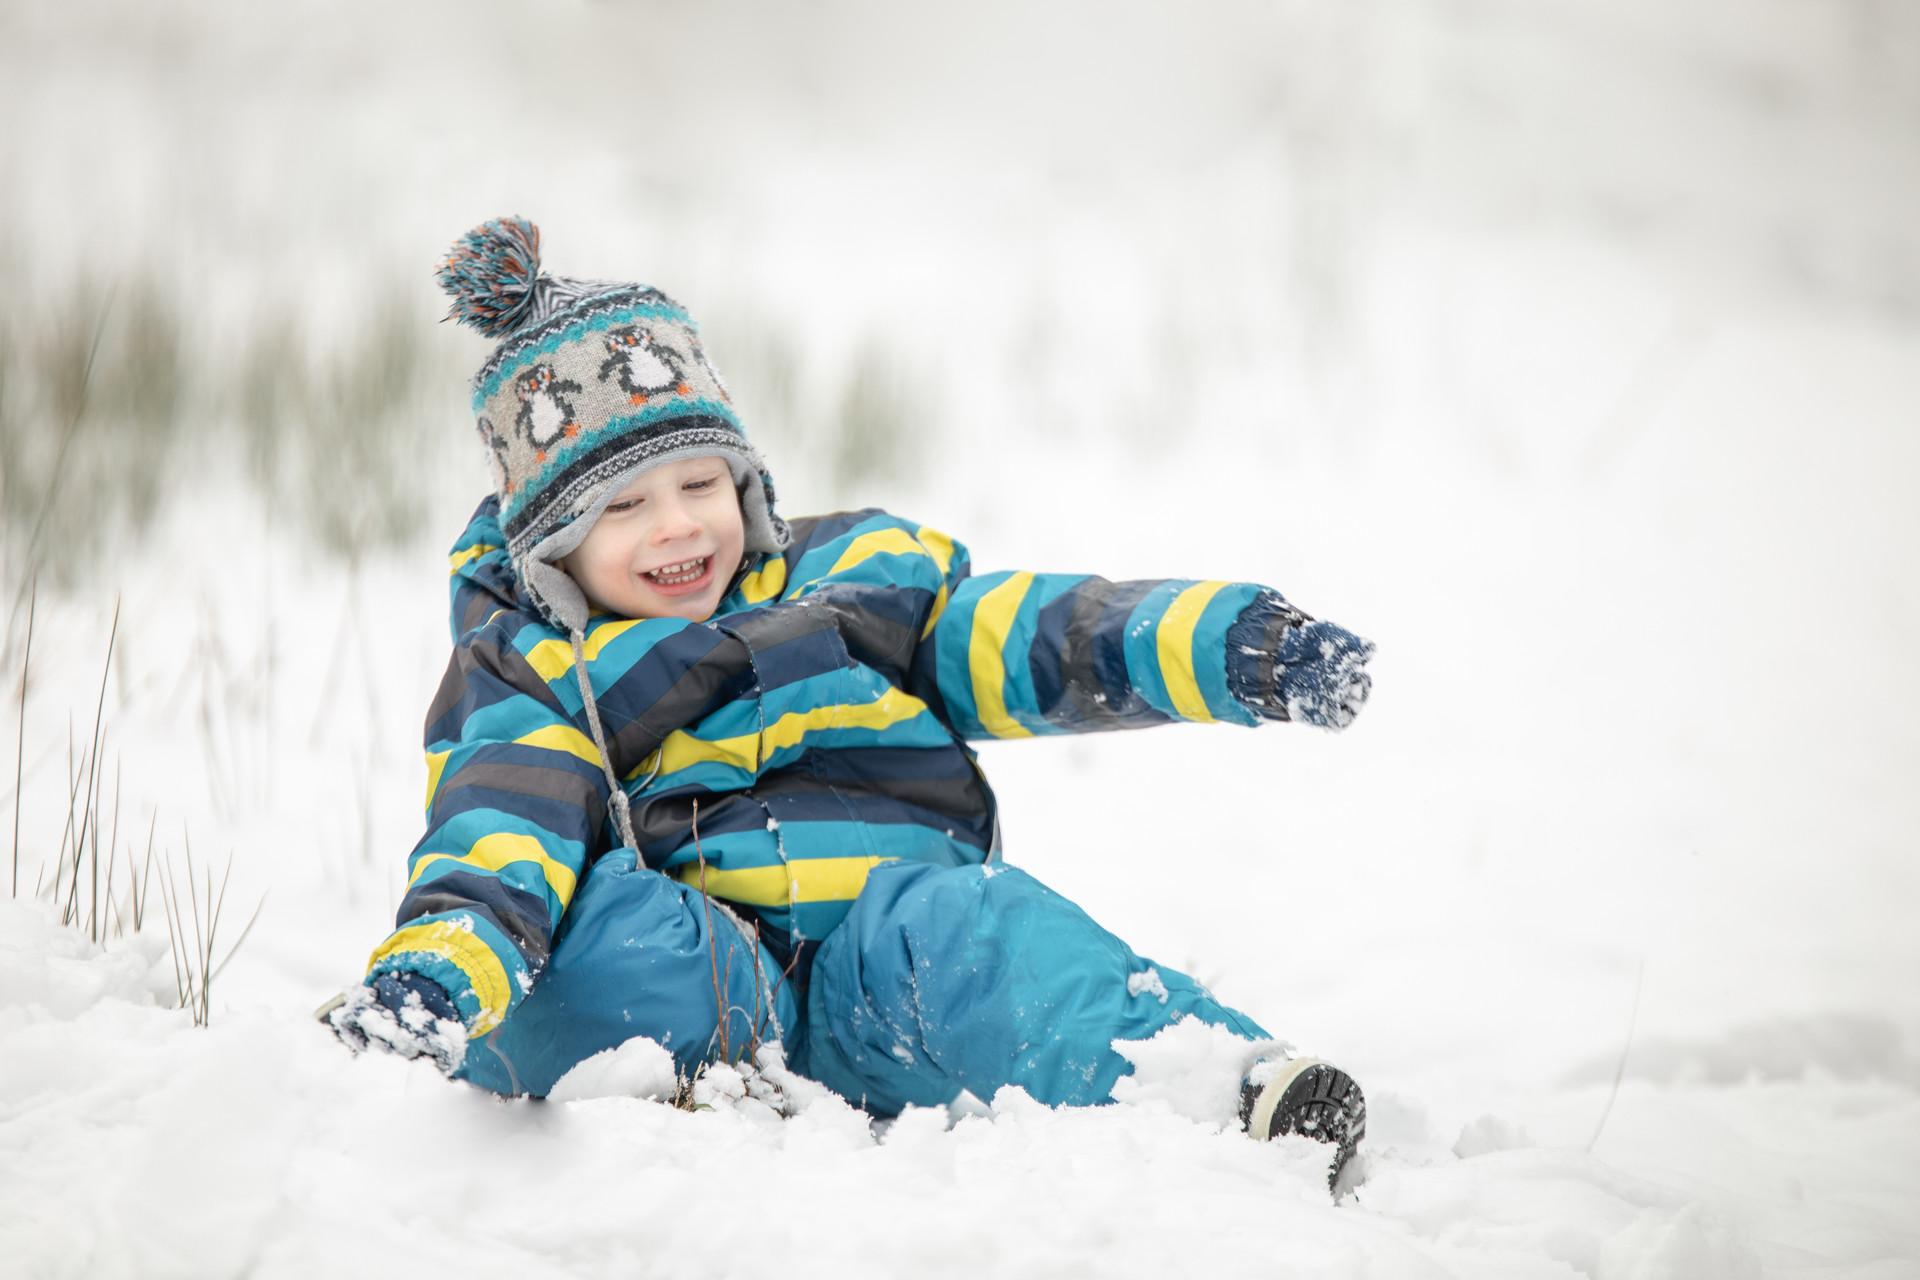 Familienshooting im Schnee20190112-28.jp